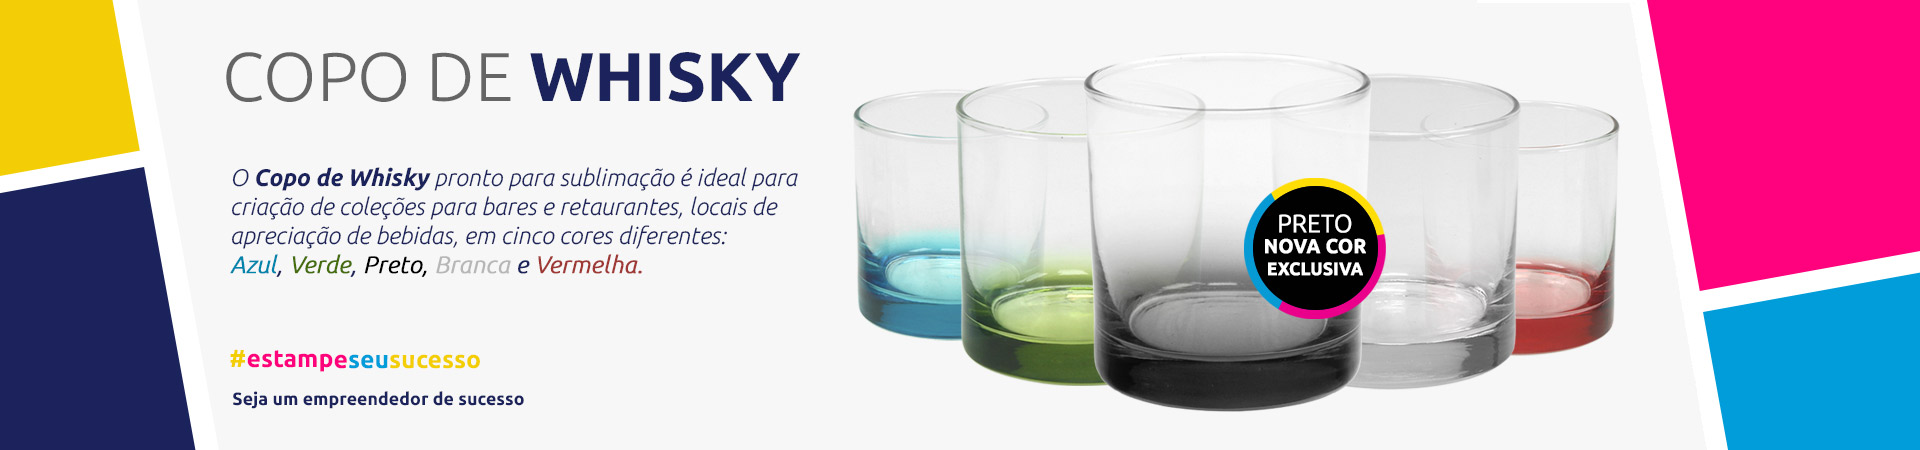 Copo Whisky